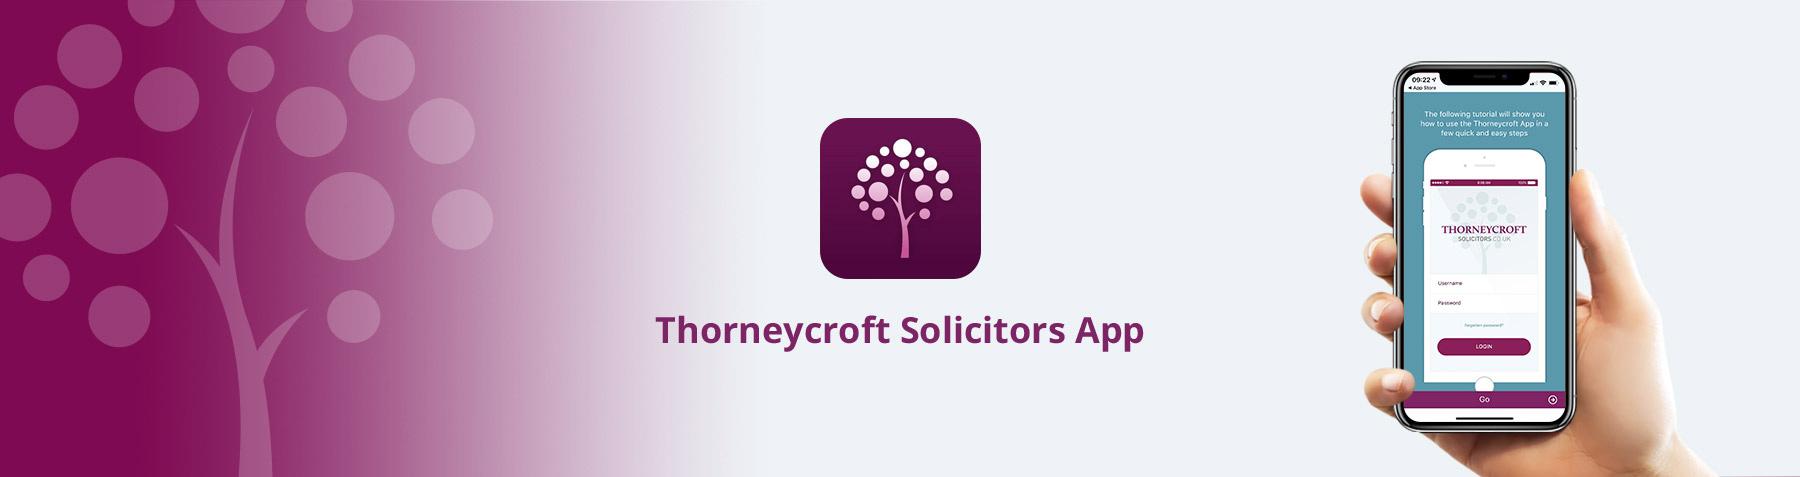 Thorneycroft Solicitors App